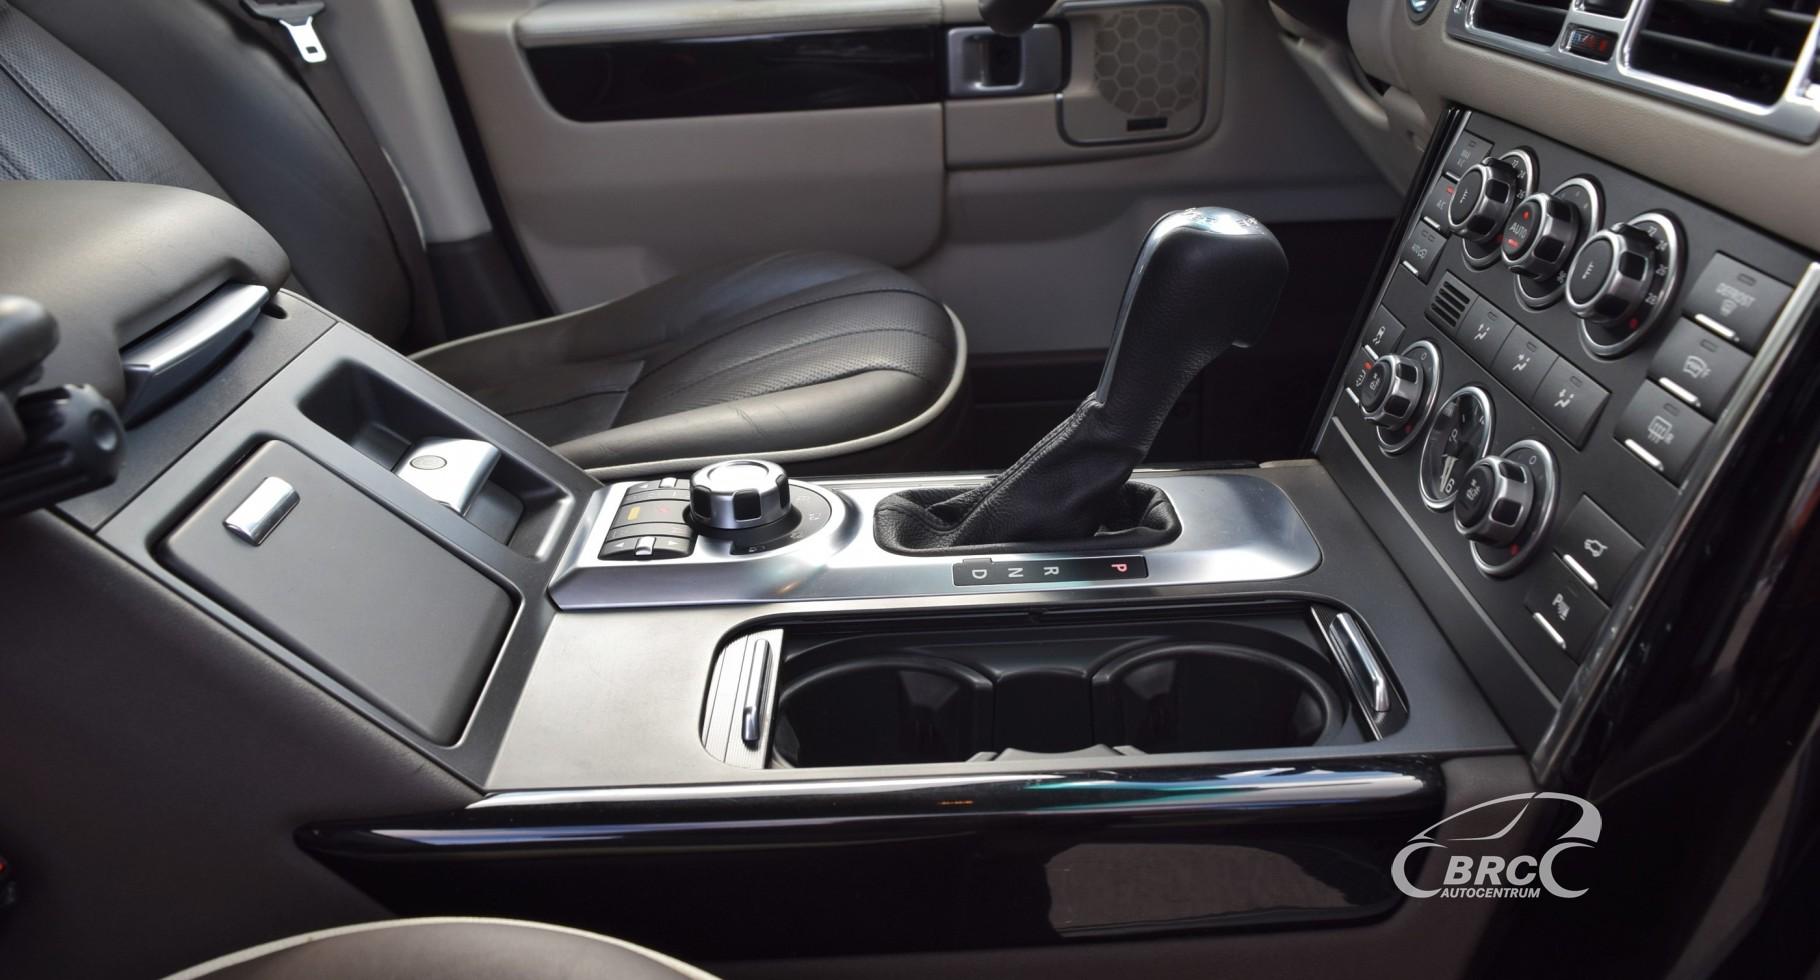 Land-Rover Range Rover Vogue TDV8